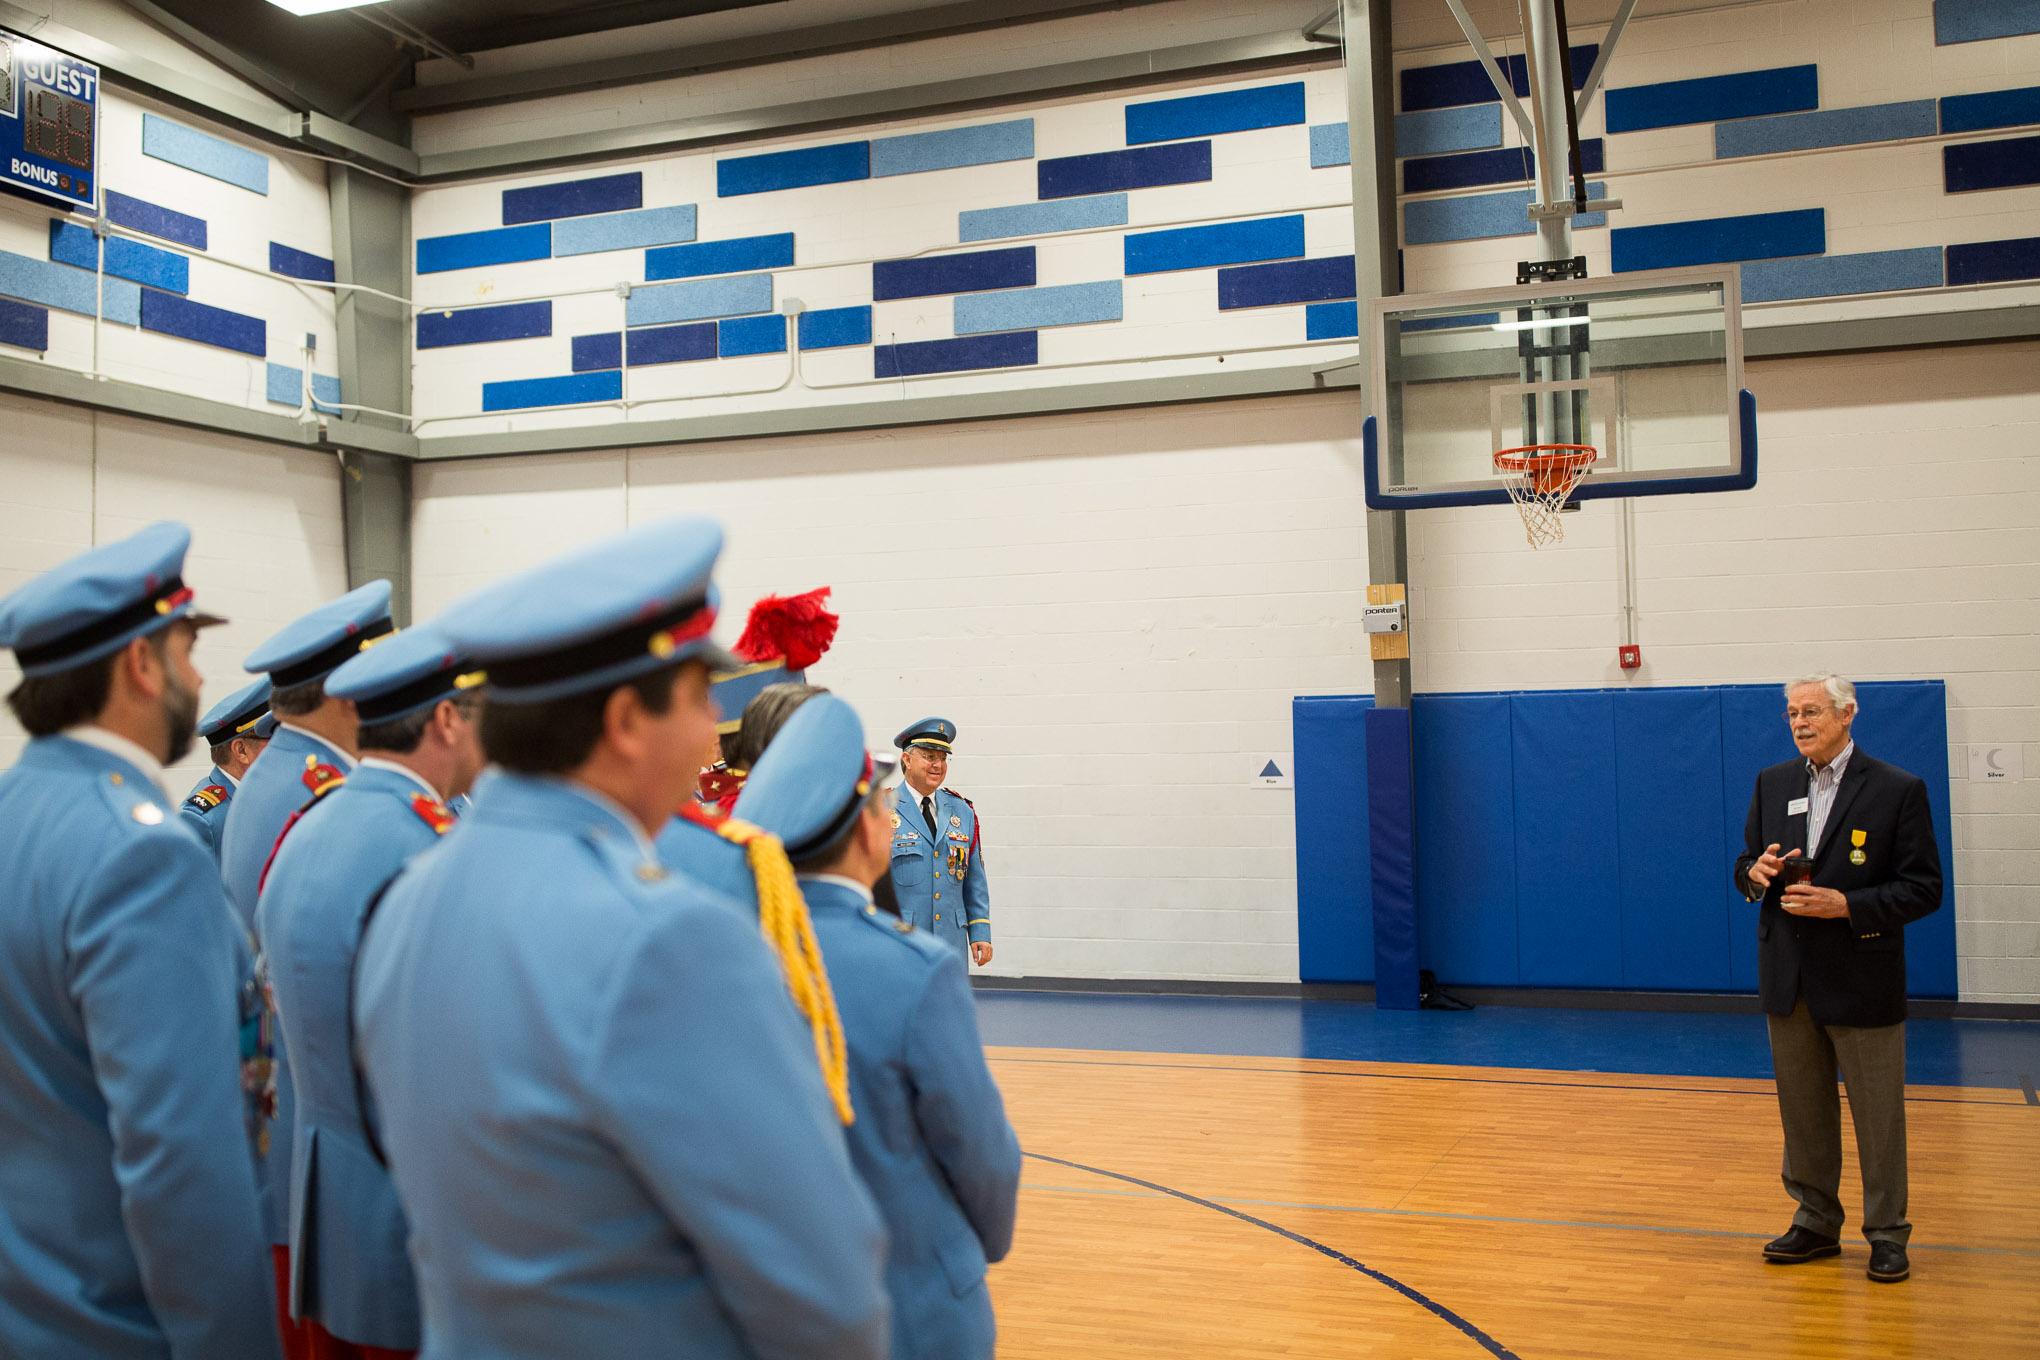 KIPP Board Member Bill Moll shares a thought with Texas Cavaliers in the KIPP San Antonio gymnasium. Photo by Scott Ball.